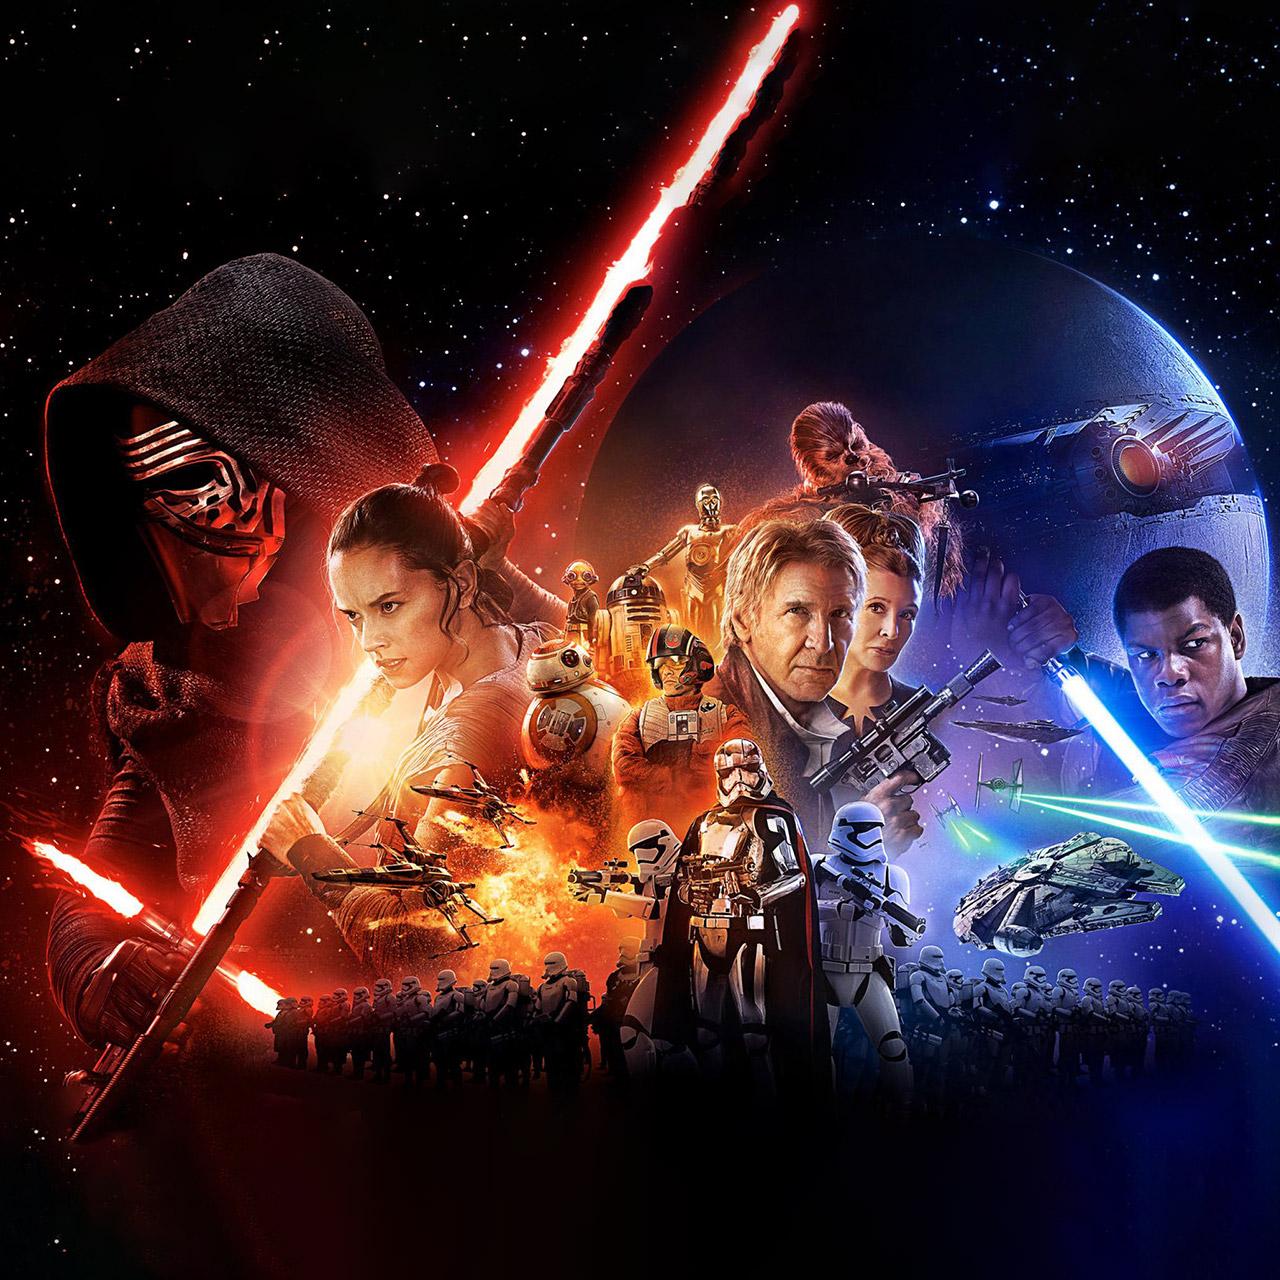 Star Wars The Force Awakens Samsung Galaxy Tab 7 wallpapers Tablet 1280x1280